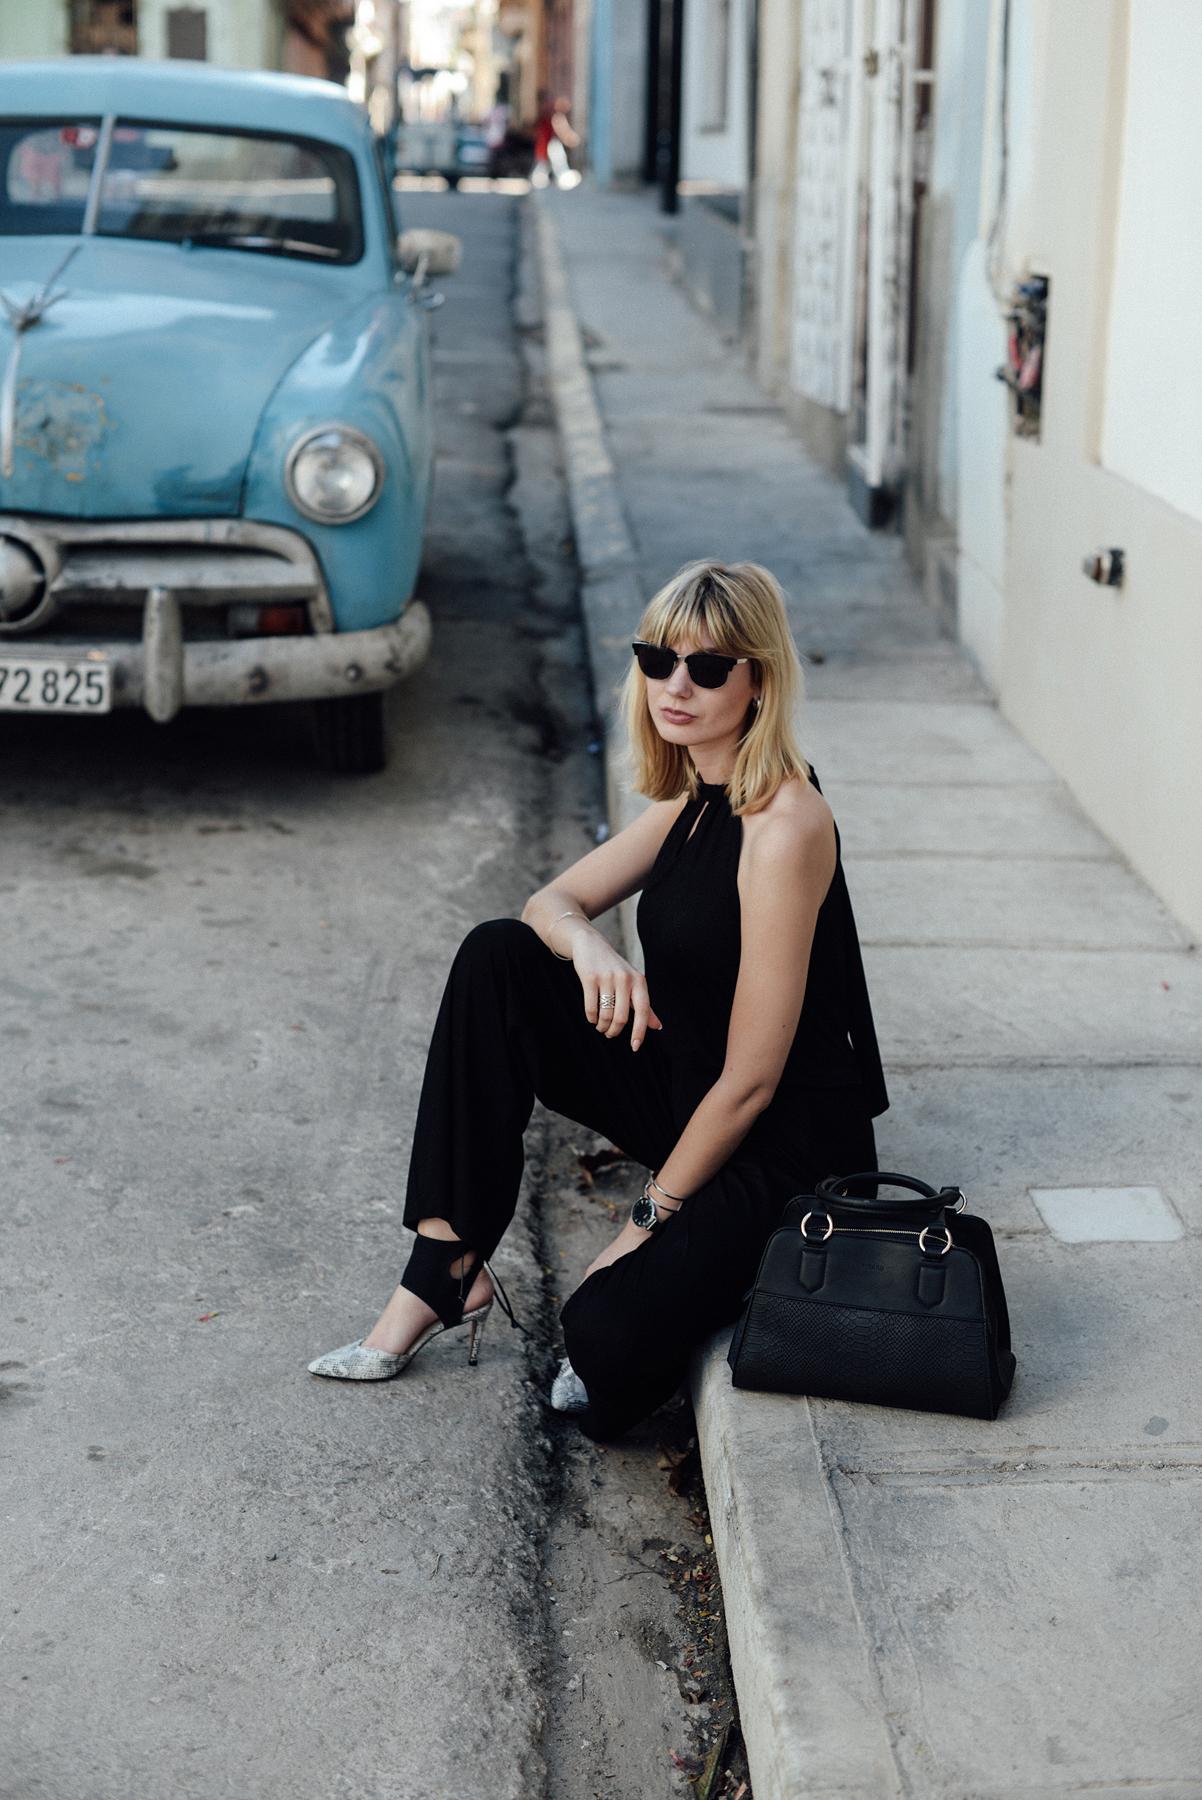 Kiamisu_Modeblog_Fashionblog_Alba Moda_Jumpsuit_Havanna_La Haban Vieja_Kuba Outfit-final9